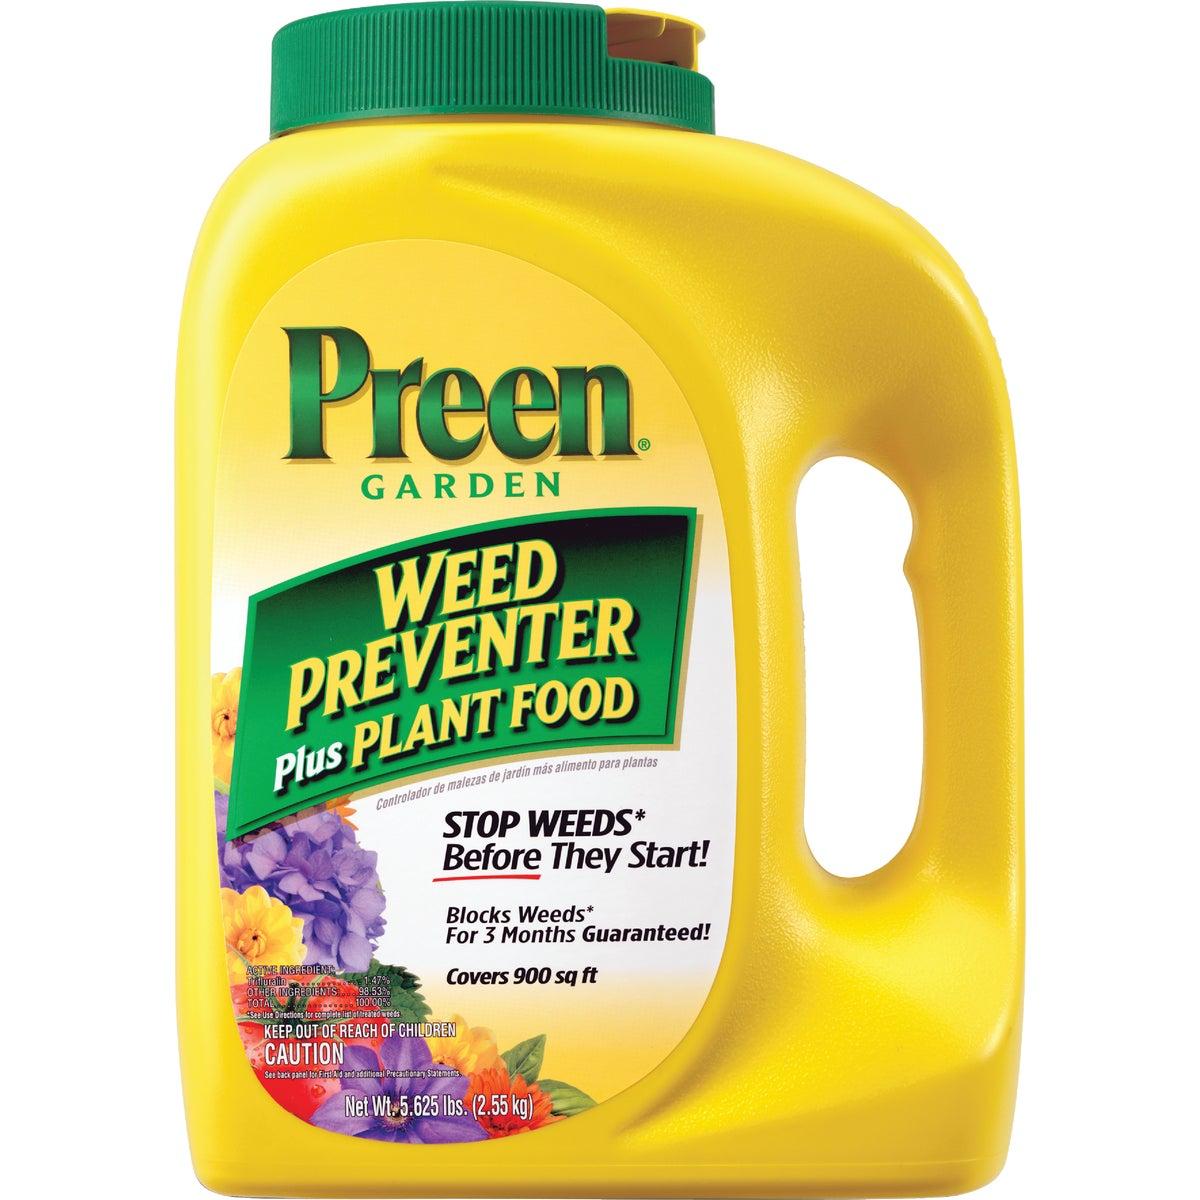 5.62#PREEN W/PLANT FOOD - 21-63902 by Lebanon Seaboard Cor